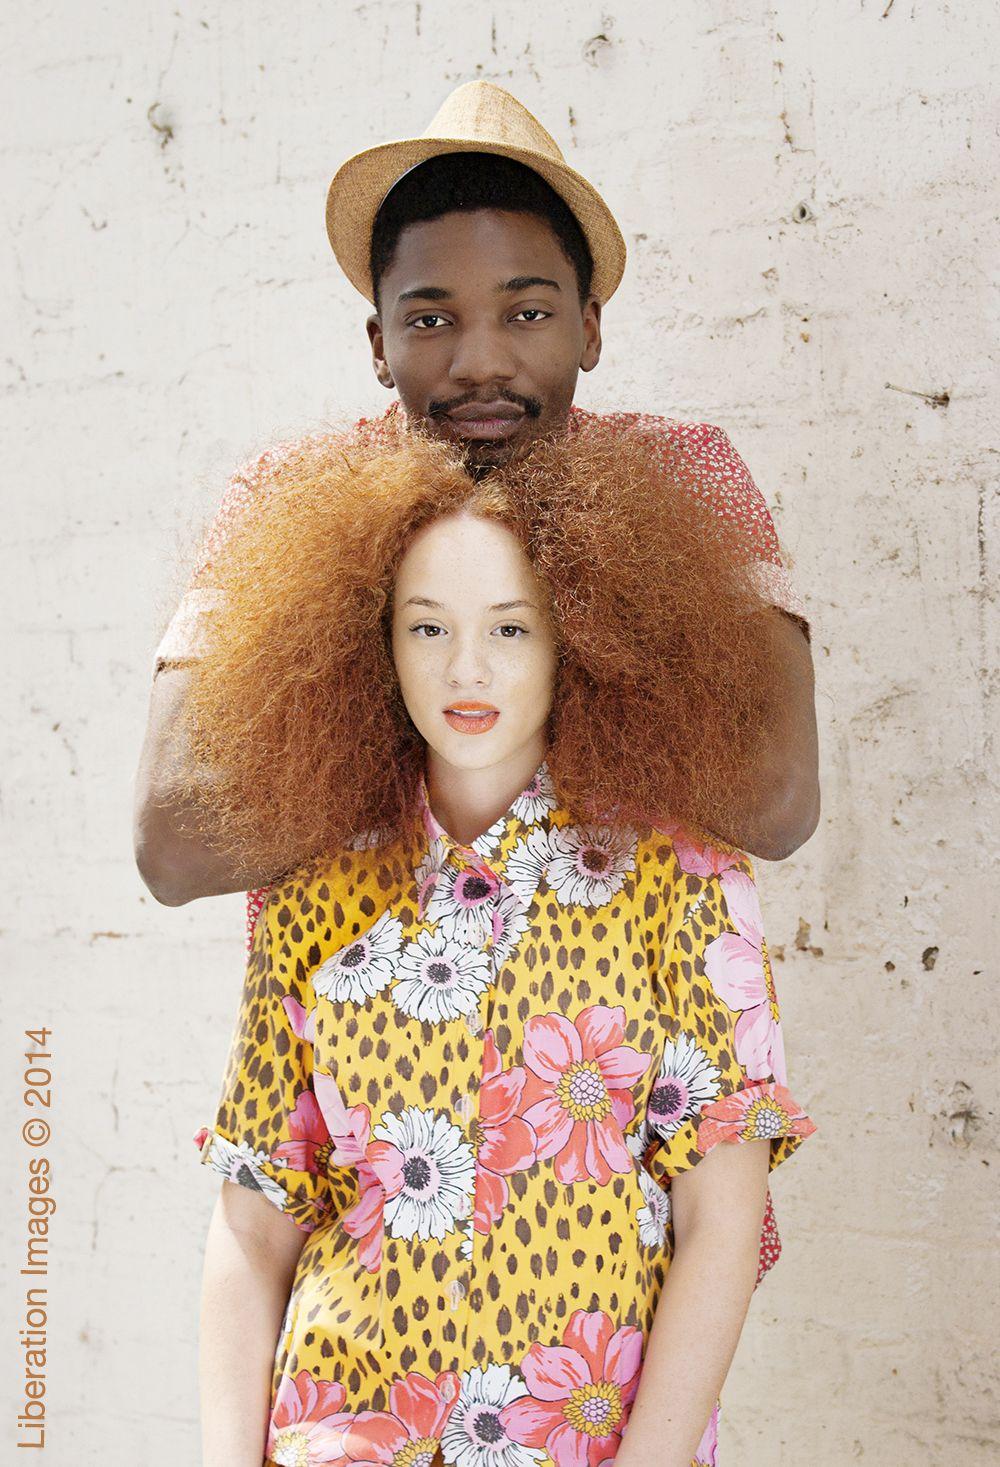 Models Chloe Cedric Fashion The Social Studio Photographer Lisa Minogue Of Liberation Images Insta Liberationimages Black Male Models Image Model